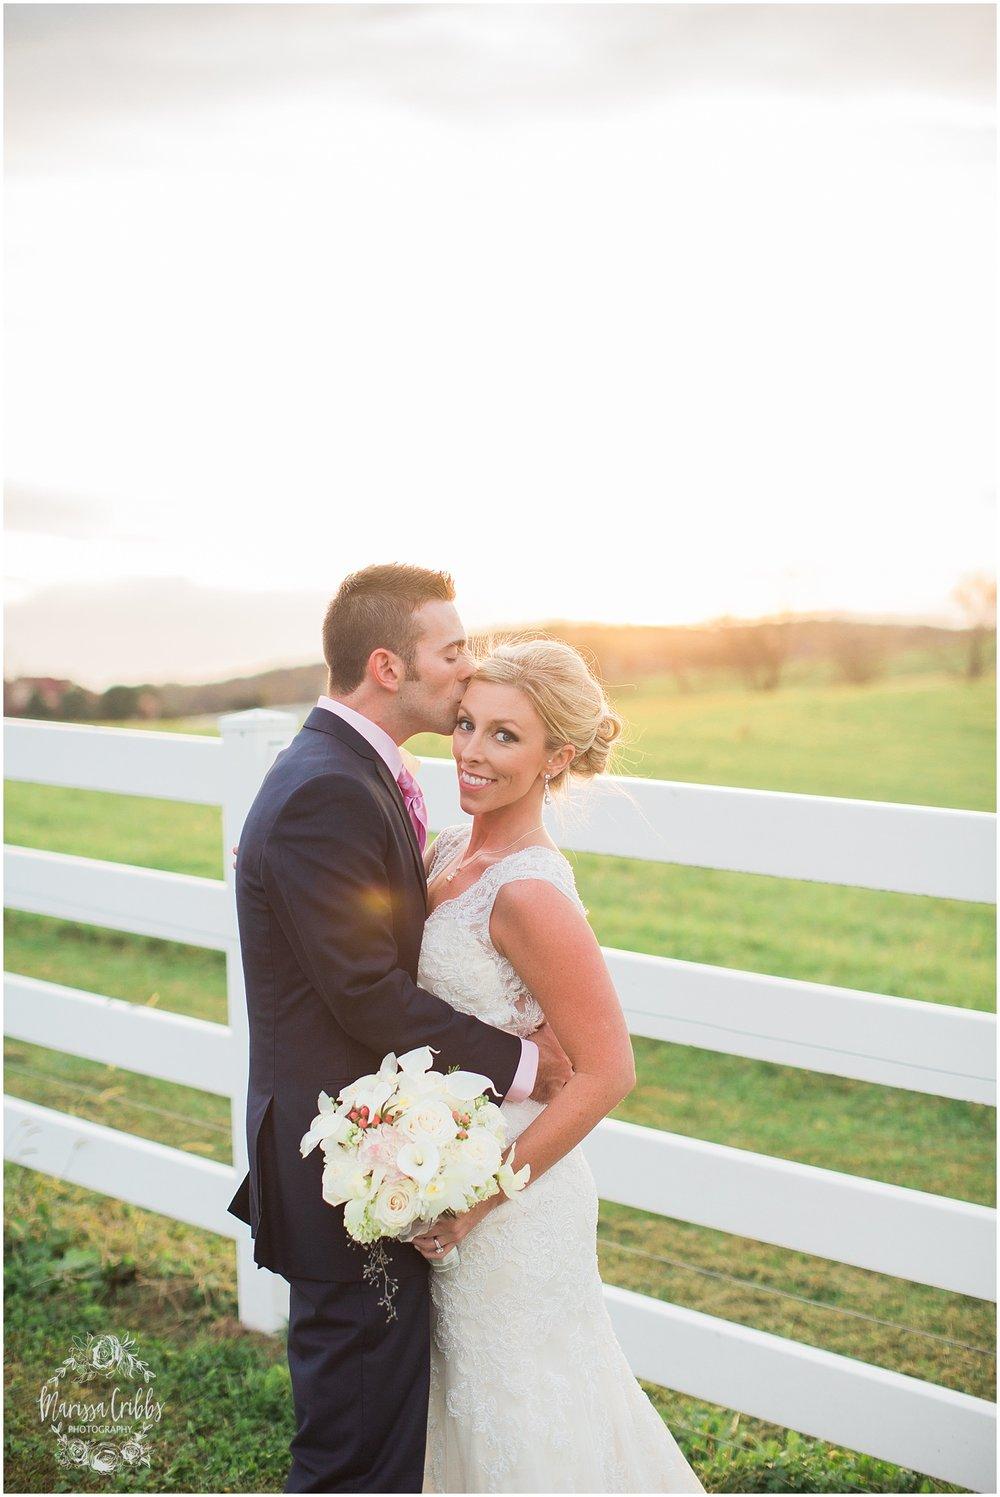 Alex & Amie | Eighteen Ninety Event Space | Marissa Cribbs Photography | Kansas City Perfect Wedding Guide_1361.jpg